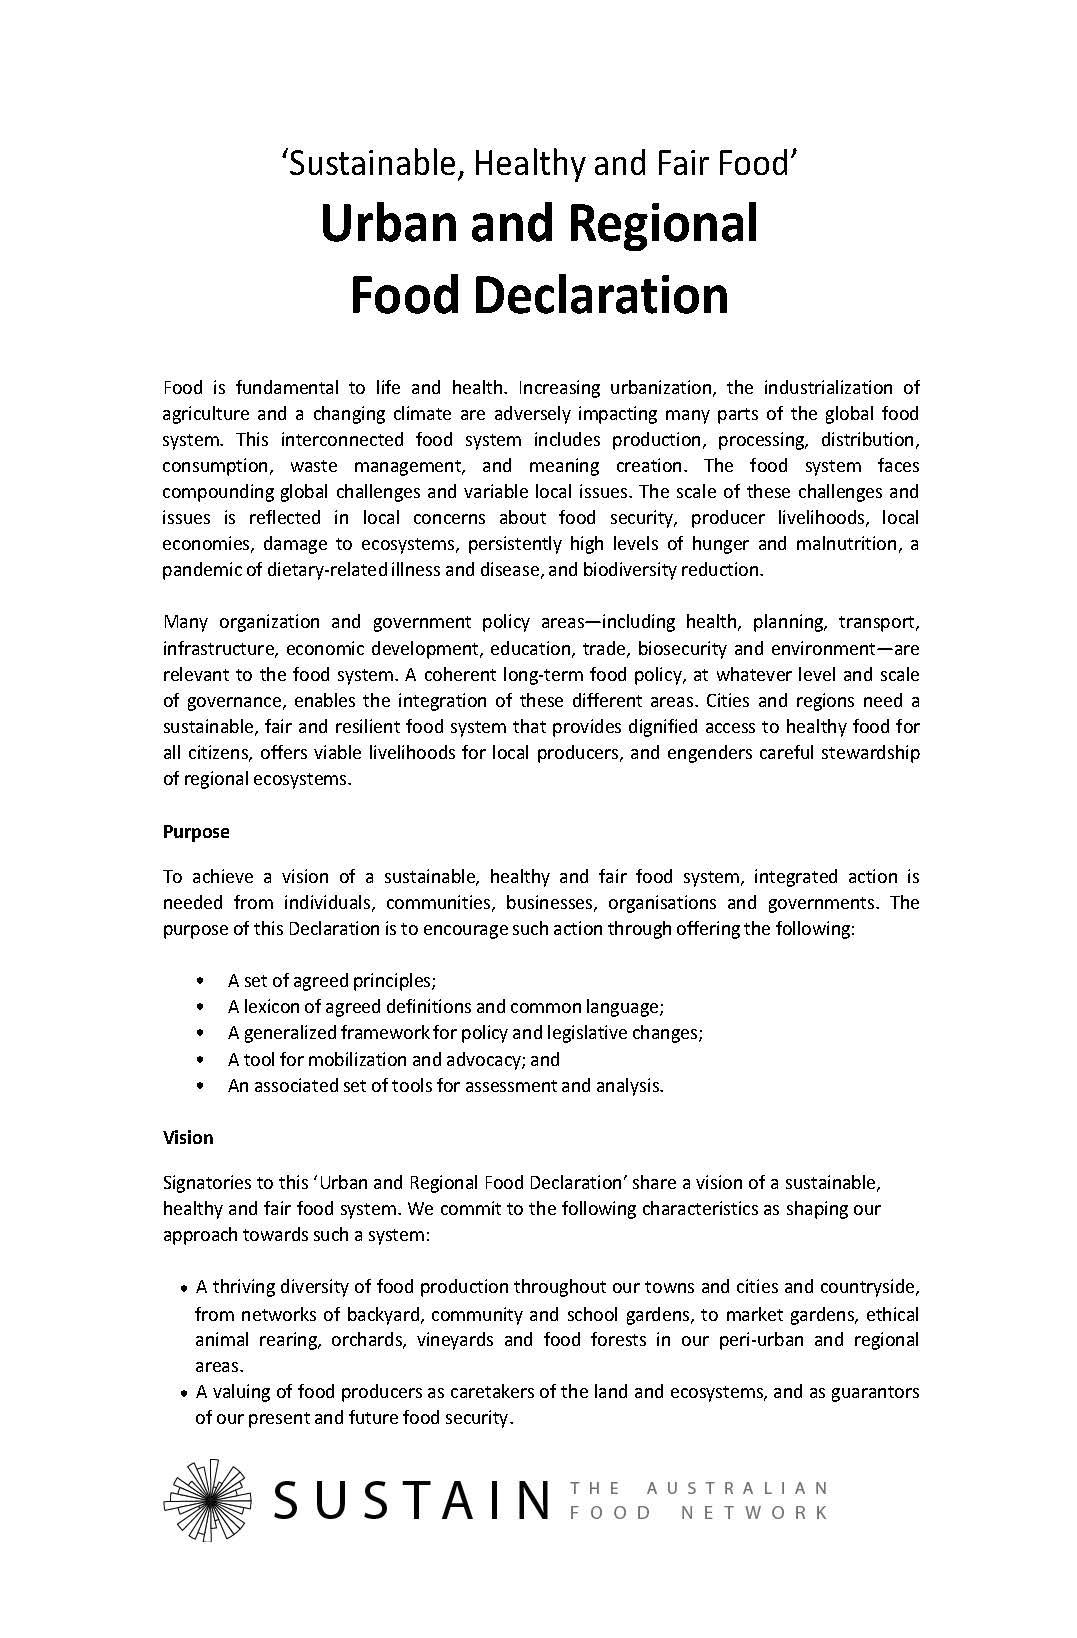 declaration sustain the australian food network